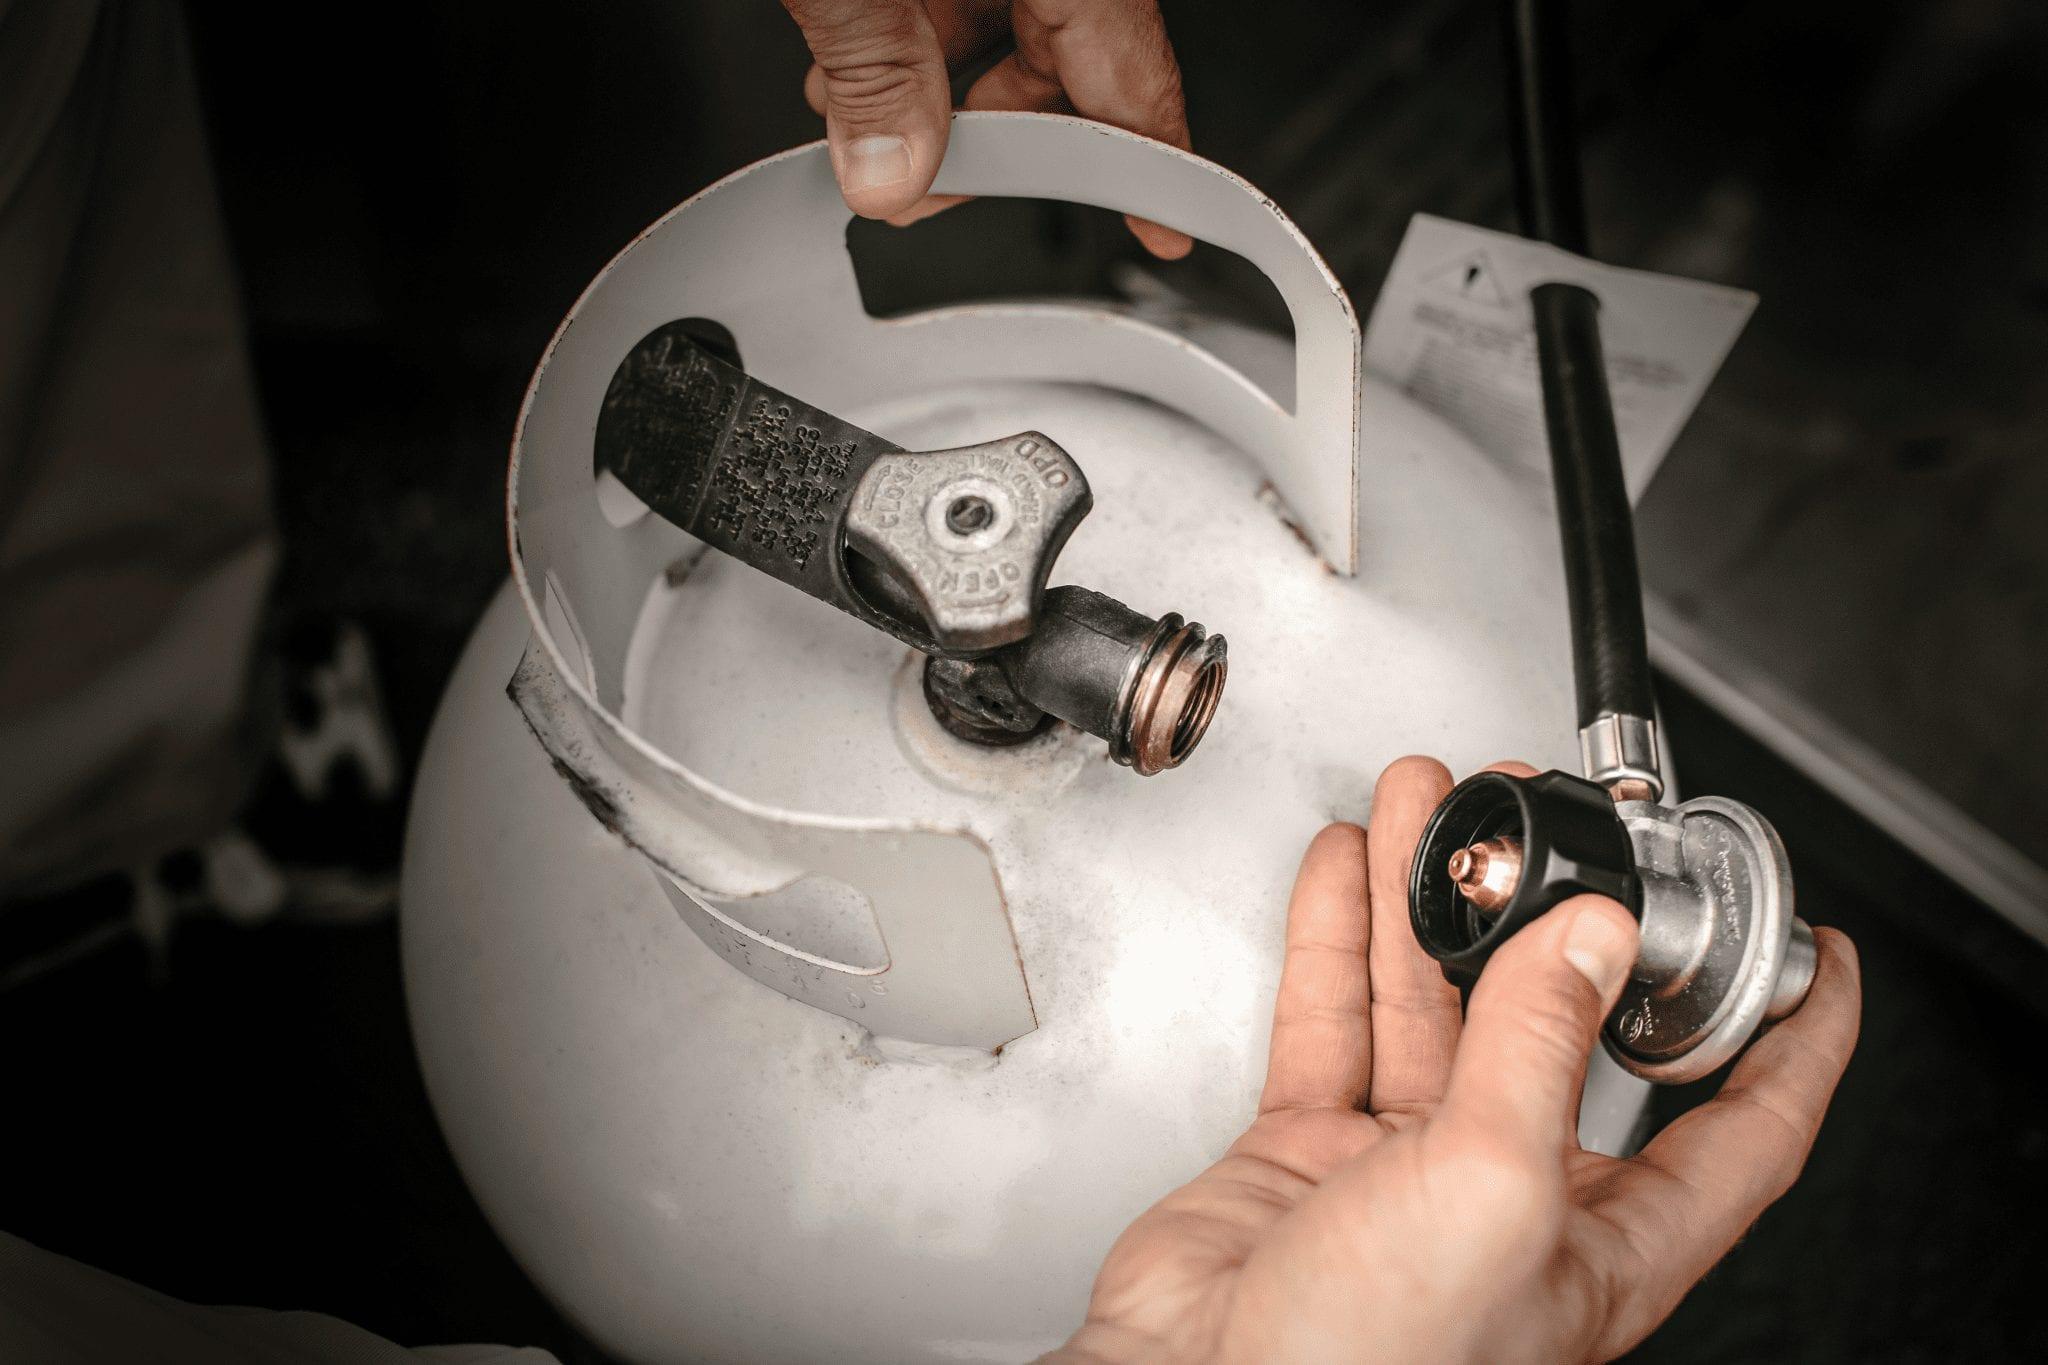 hands checking propane tank for leaks